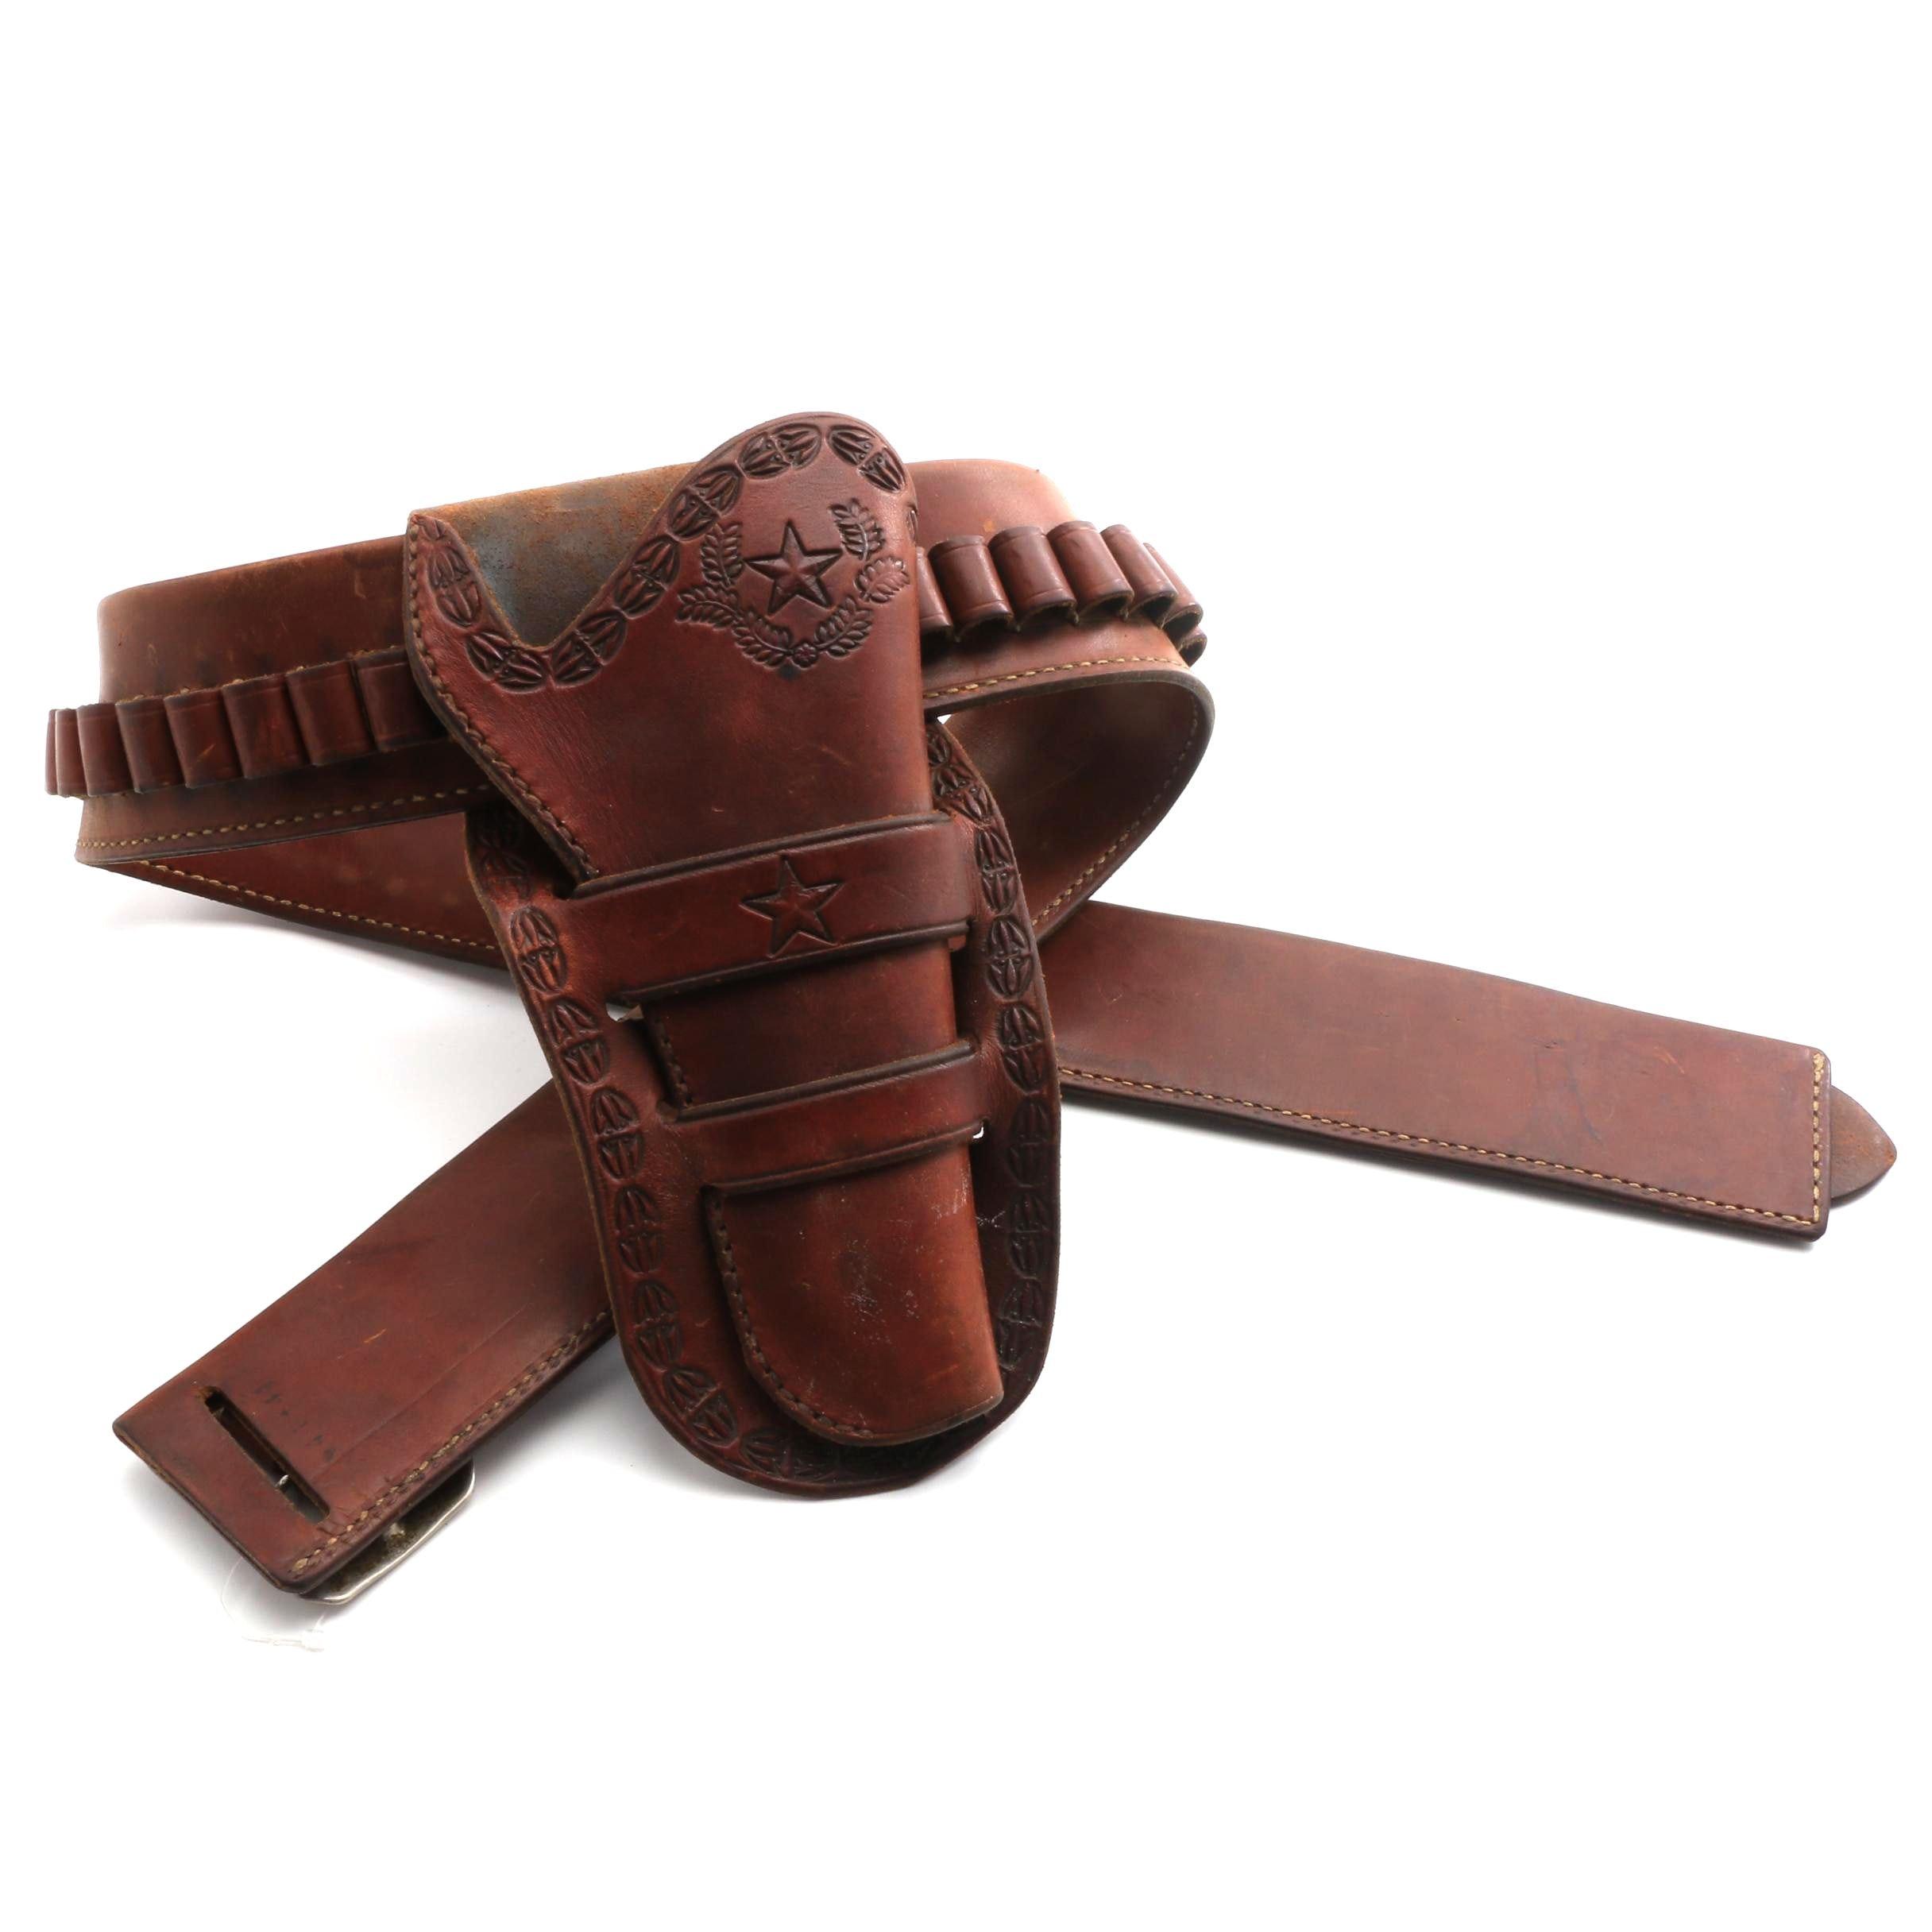 El Paso Saddlery Leather Gun Holster Belt